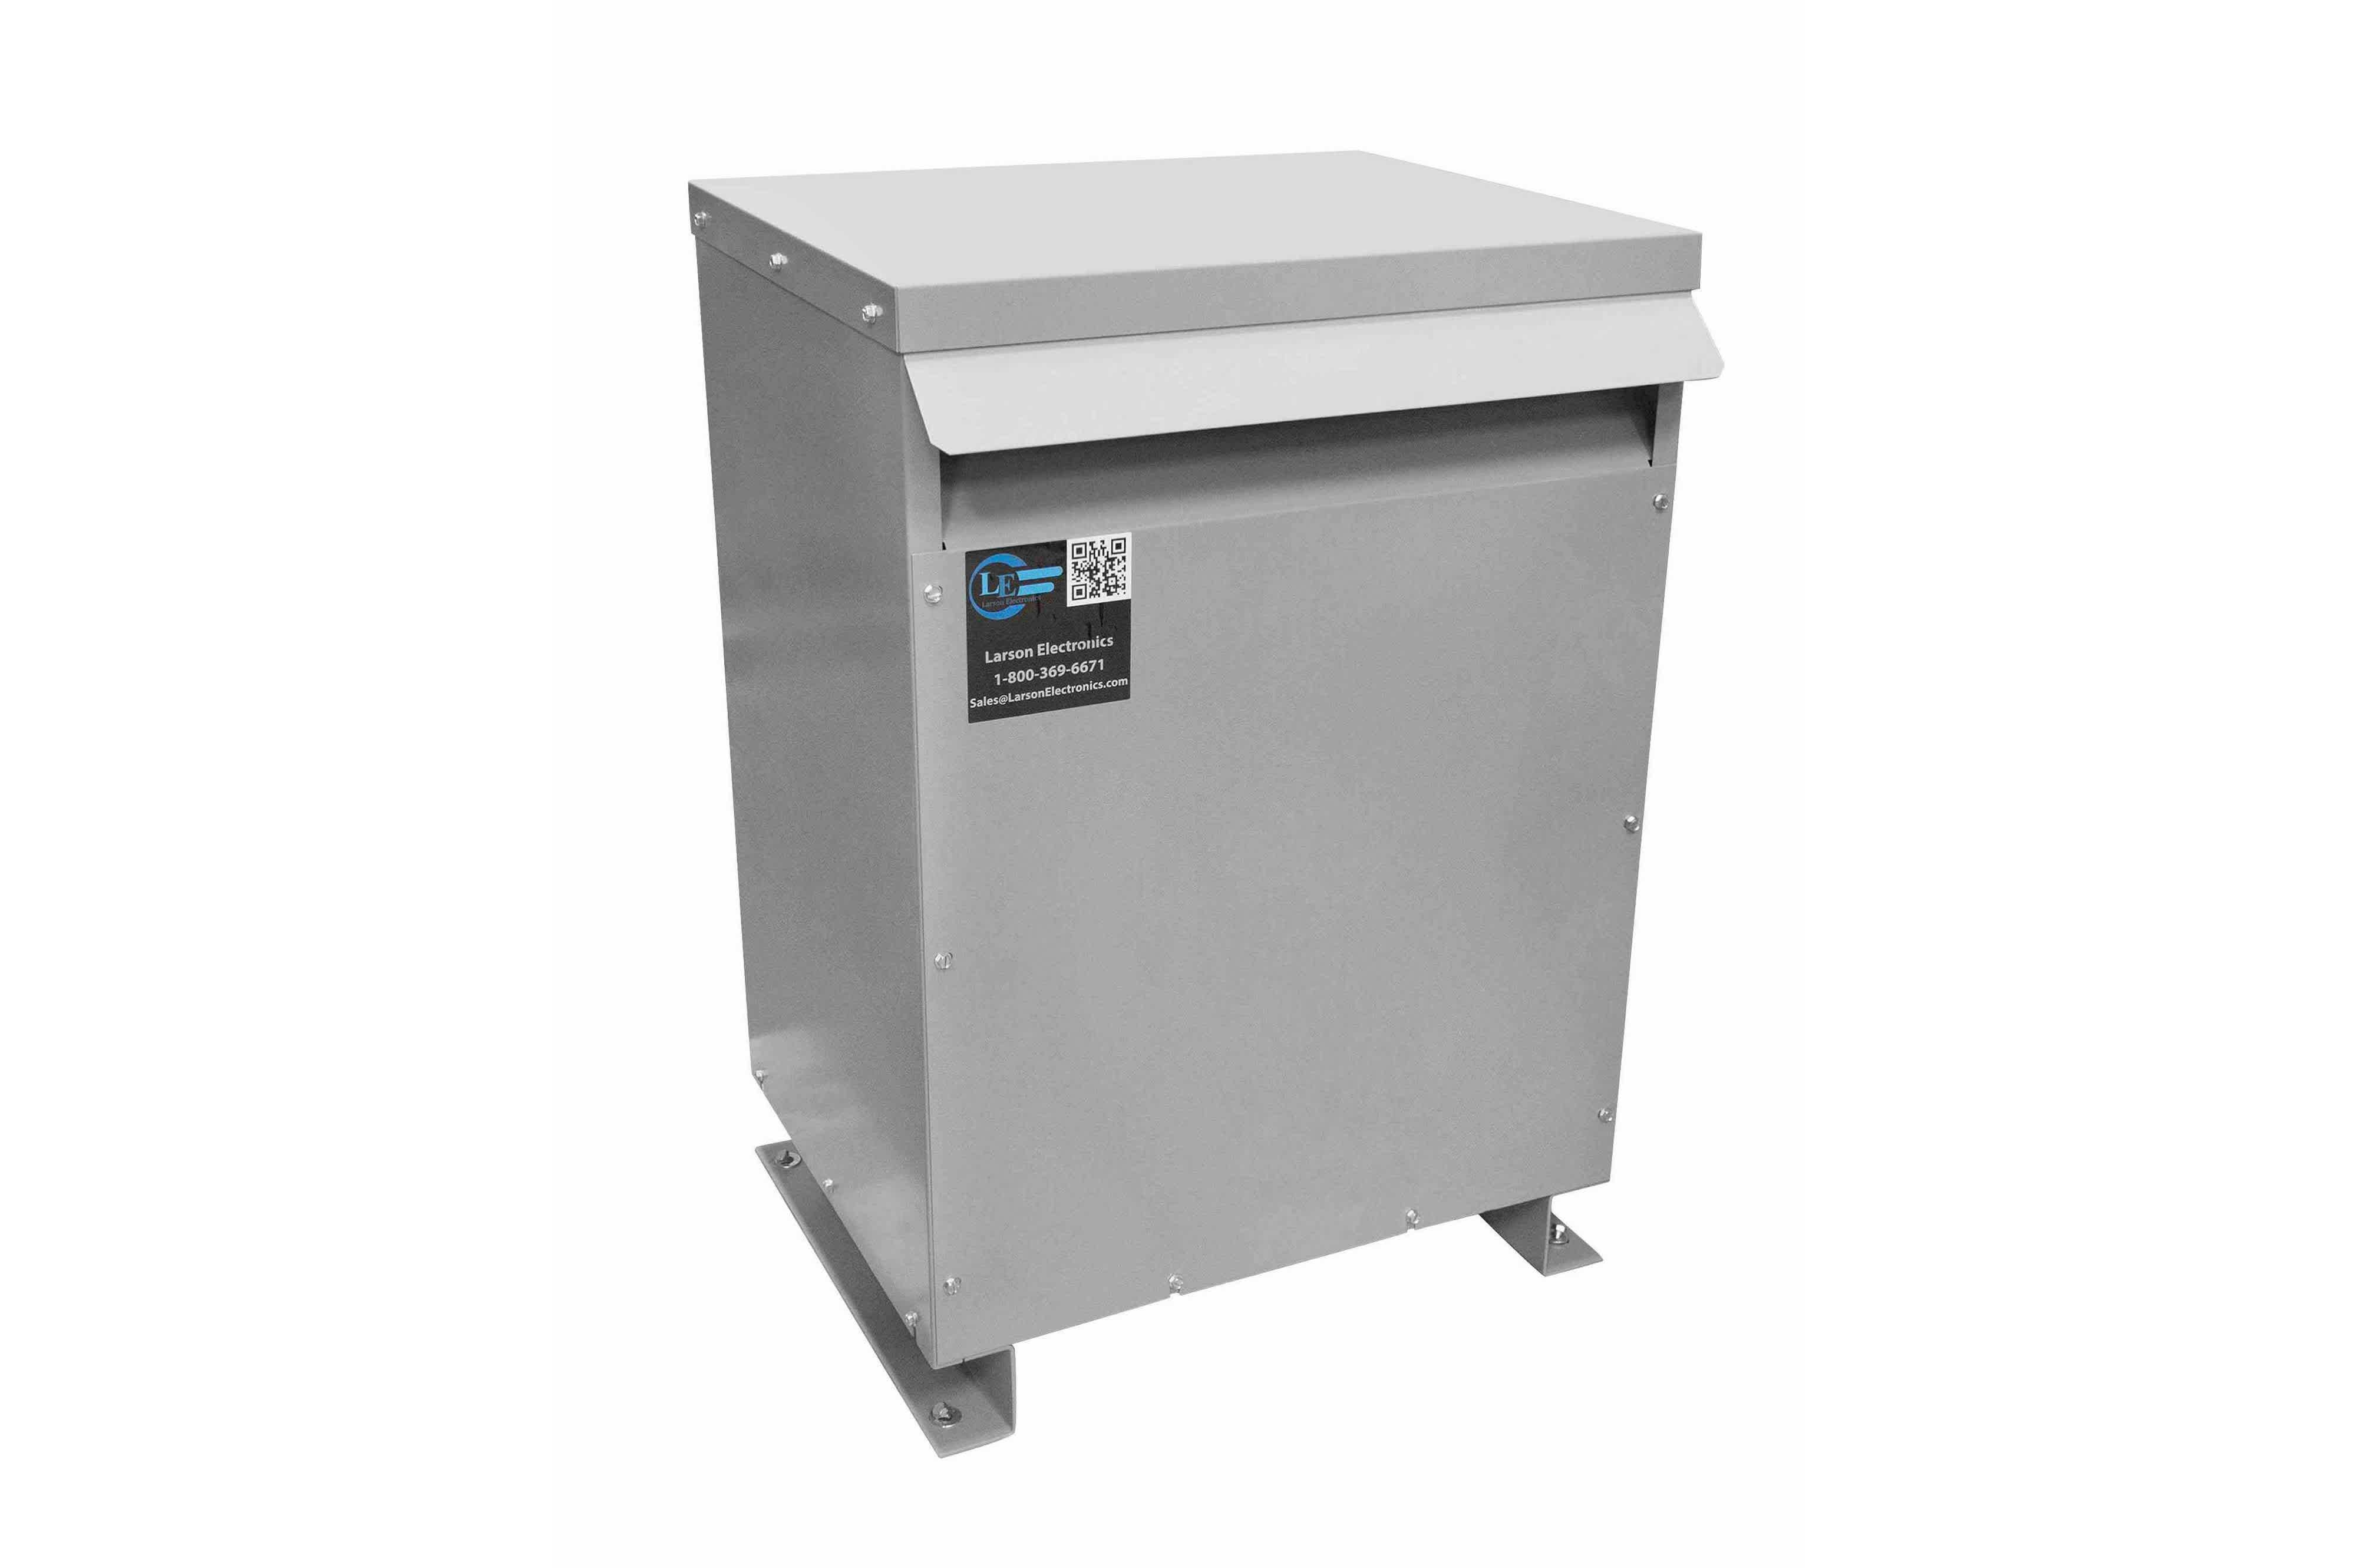 400 kVA 3PH Isolation Transformer, 600V Wye Primary, 240V/120 Delta Secondary, N3R, Ventilated, 60 Hz